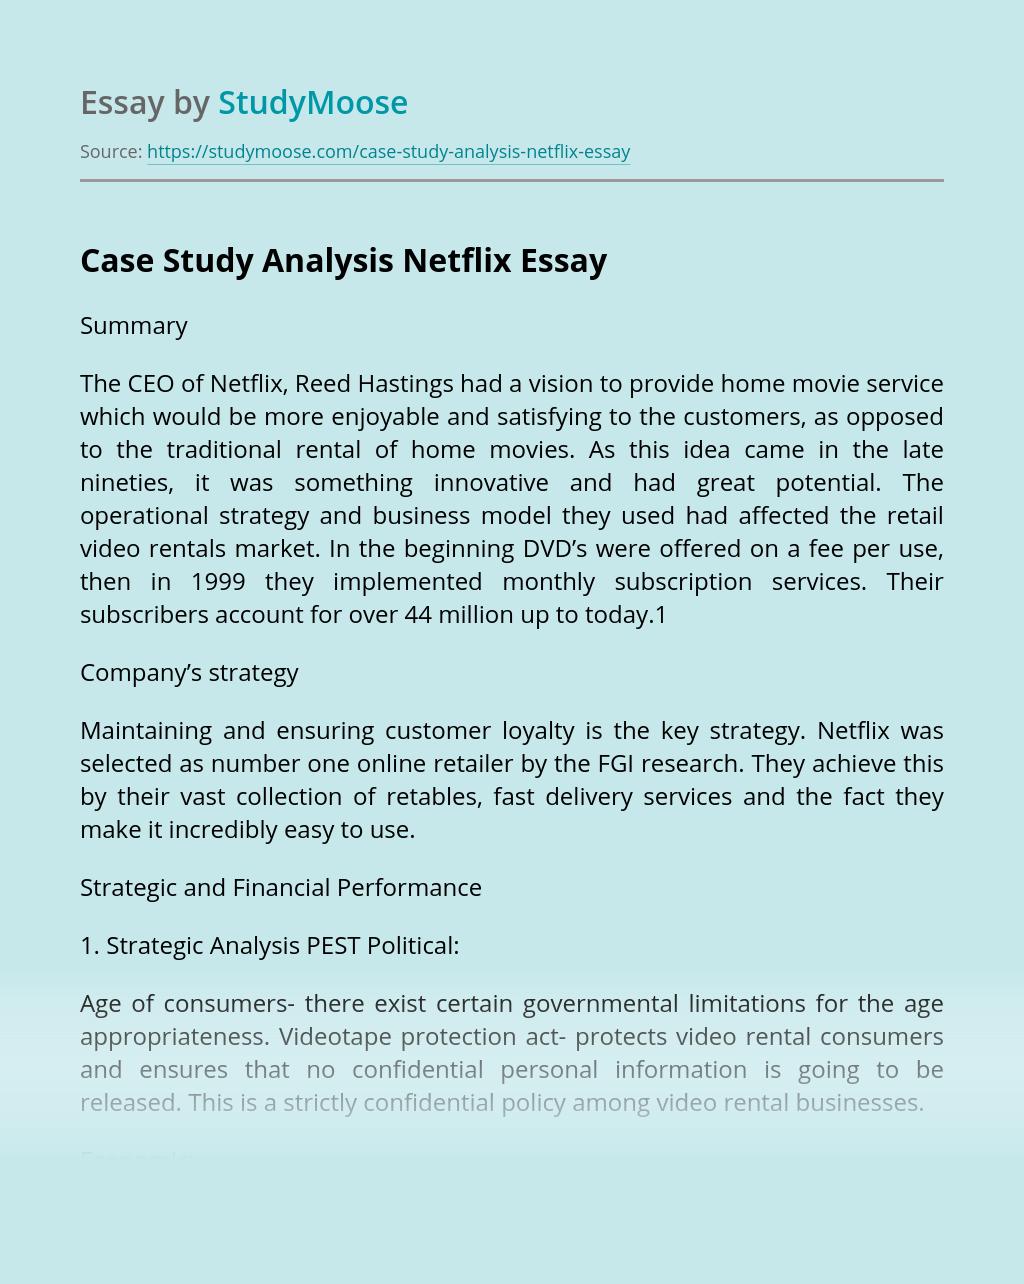 Case Study Analysis Netflix